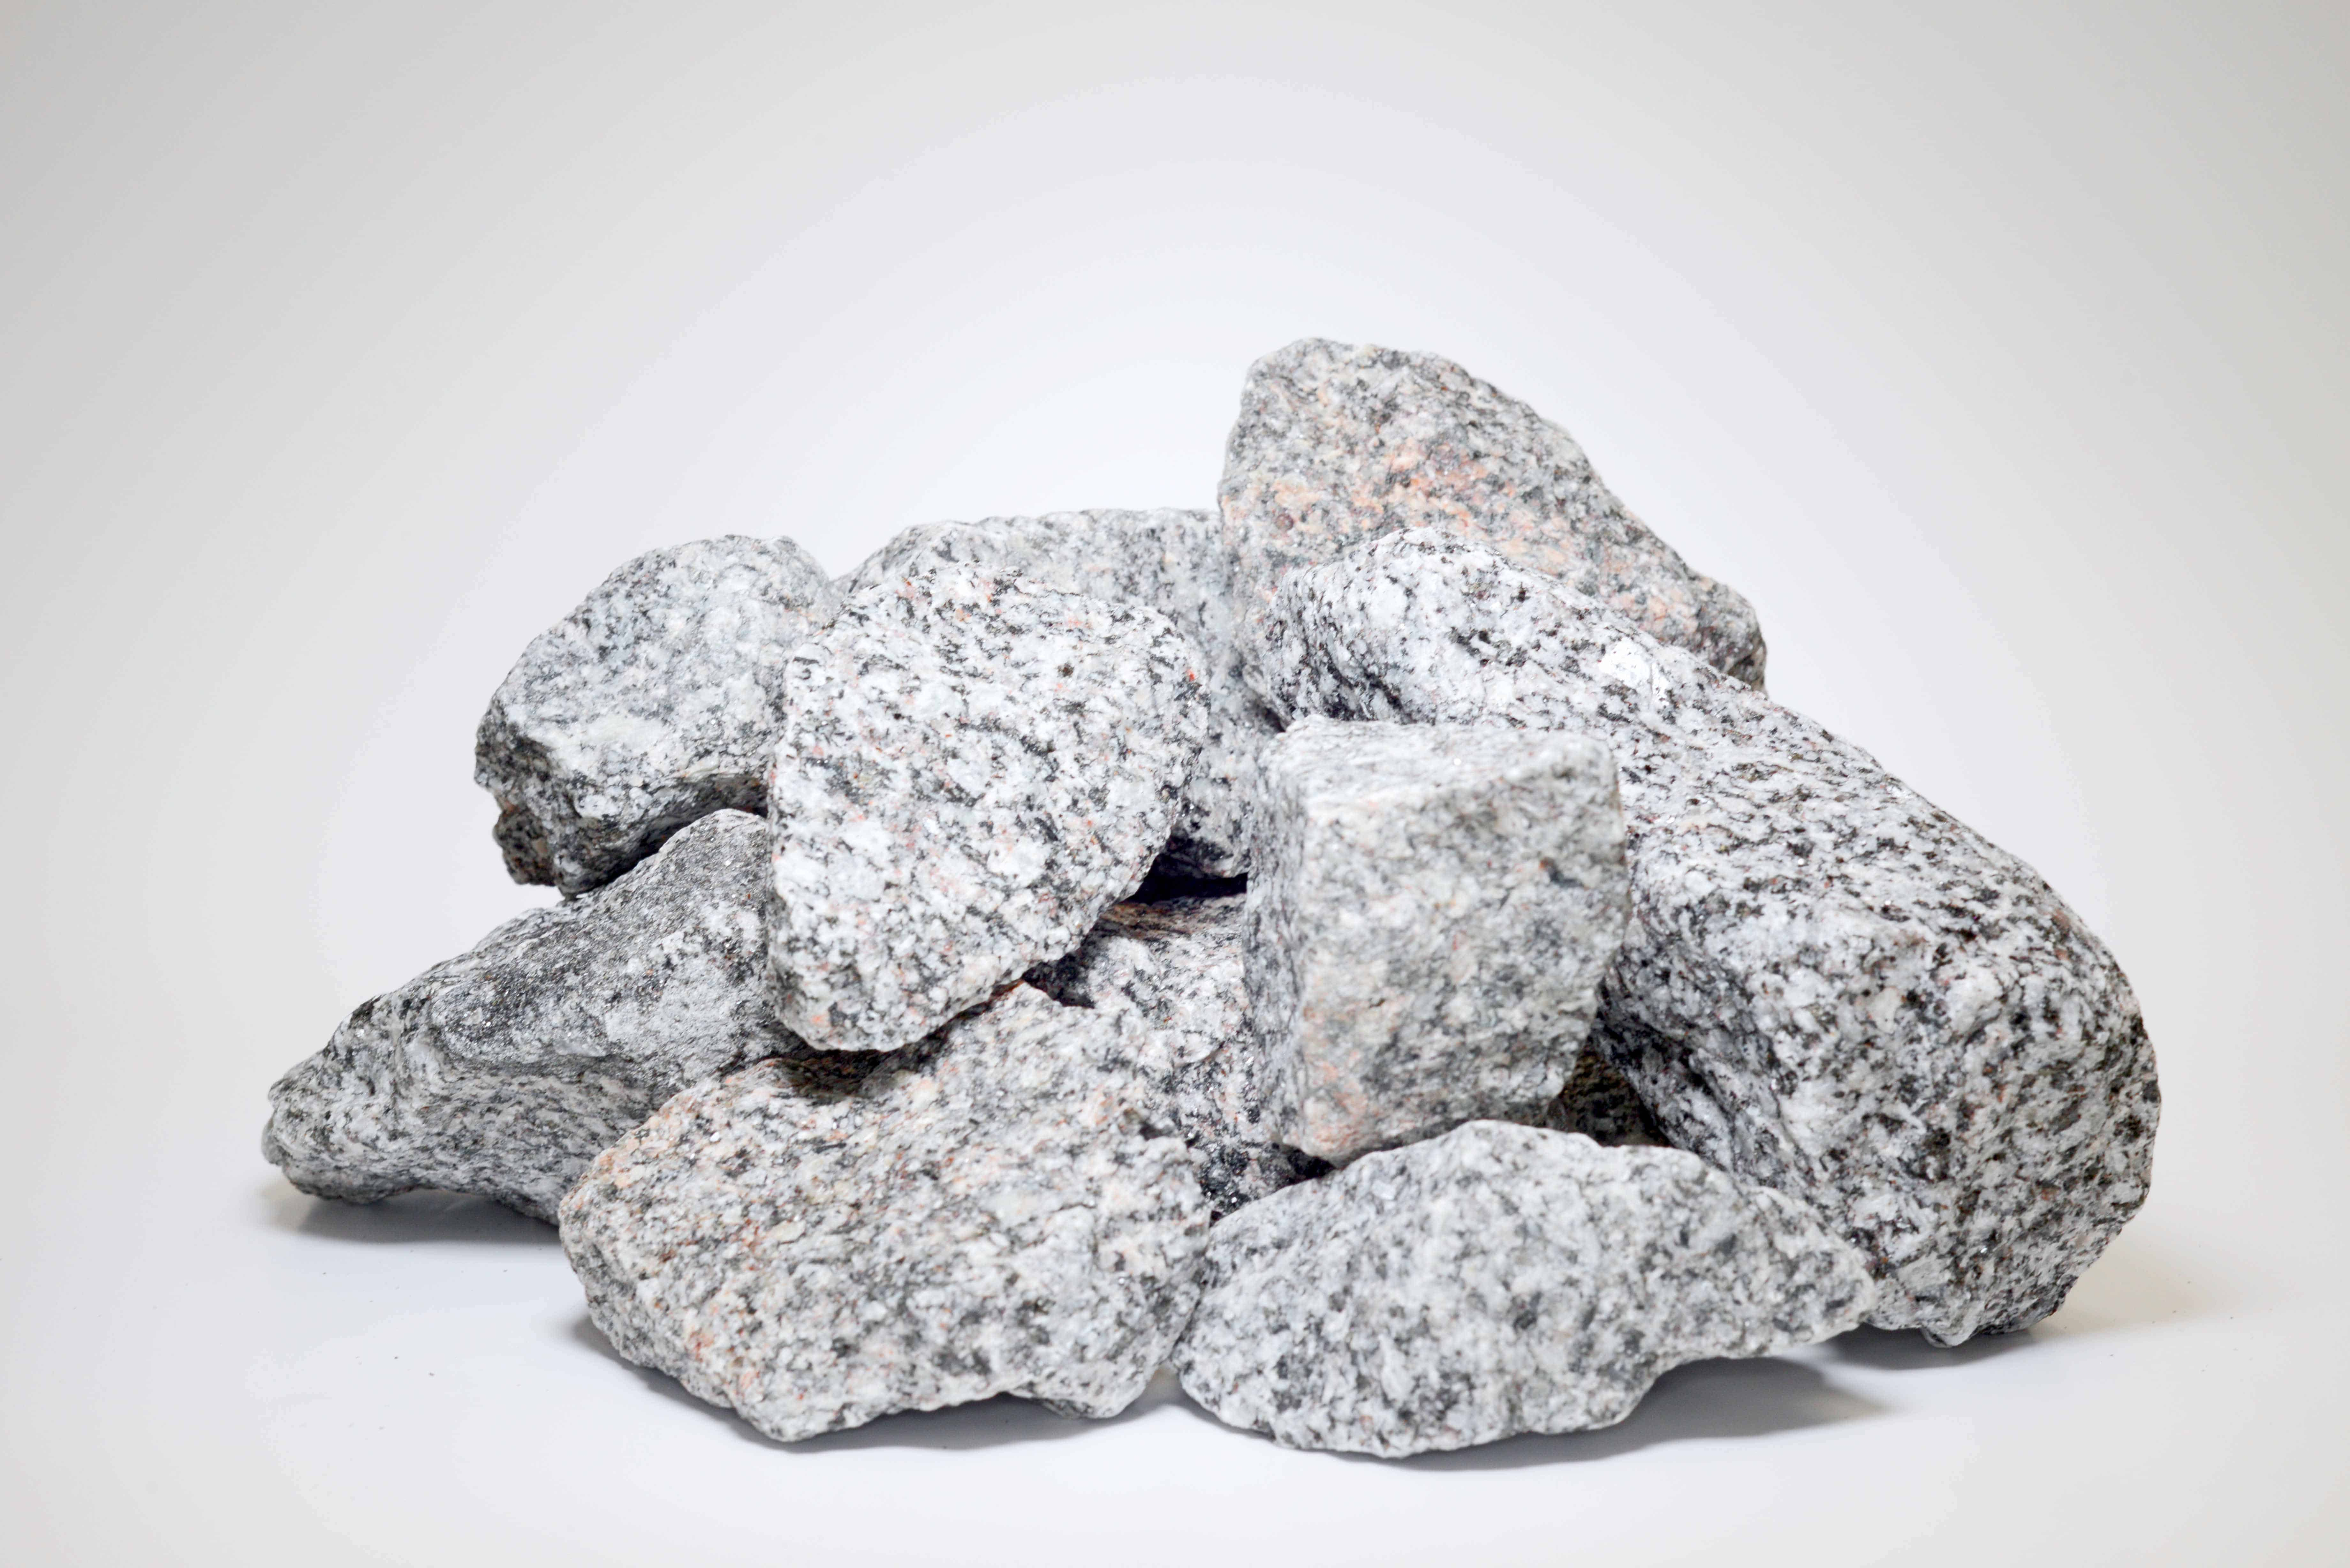 Gabionen Granit - Sack vor Orth - Heidelberg